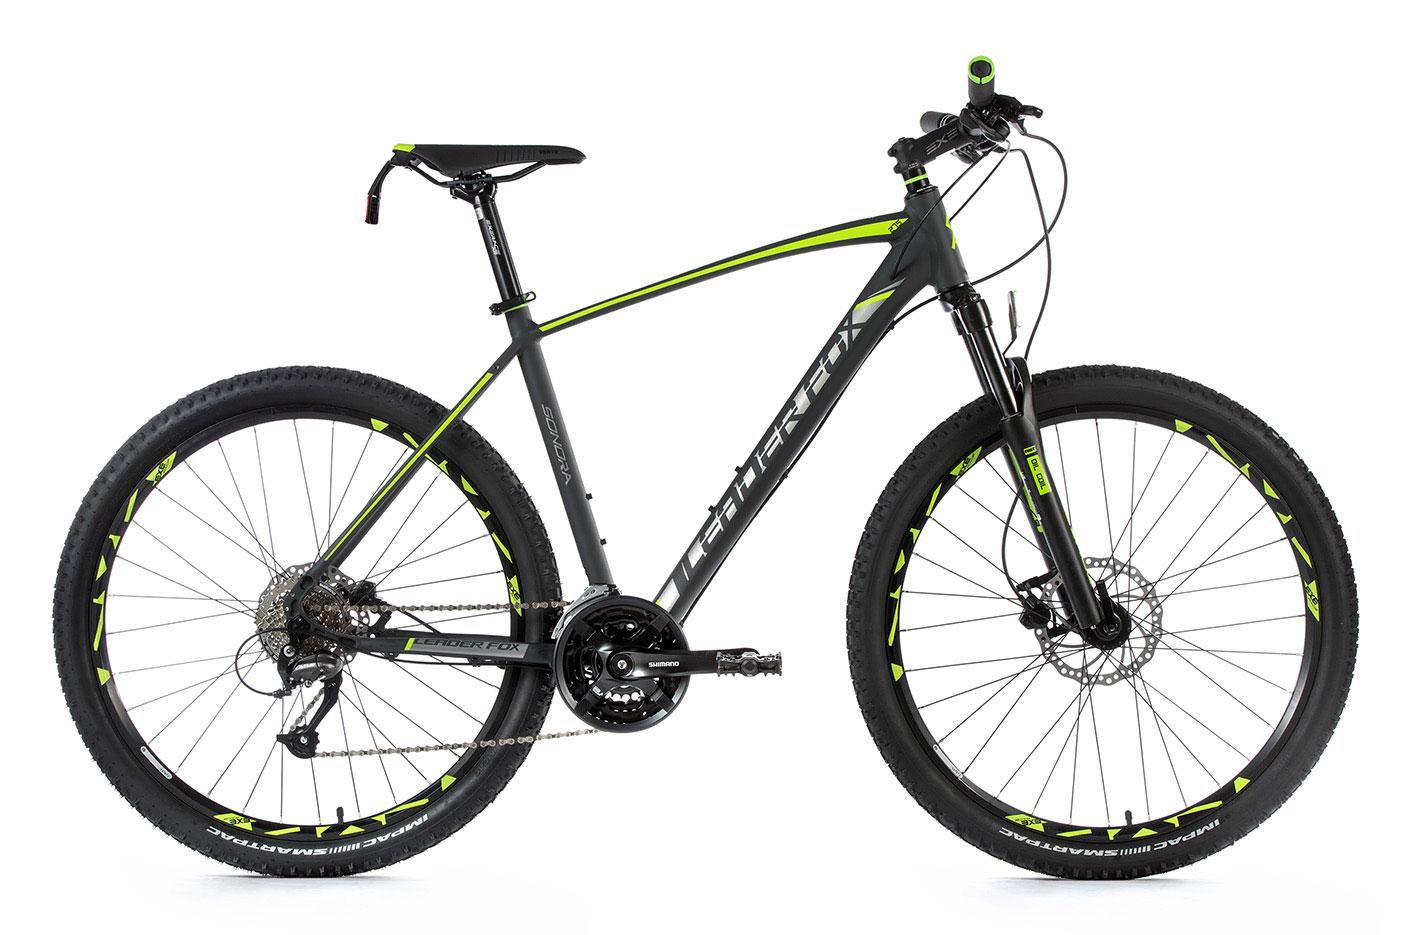 Bicicleta MTB 27.5 inch Leader Fox Sonora